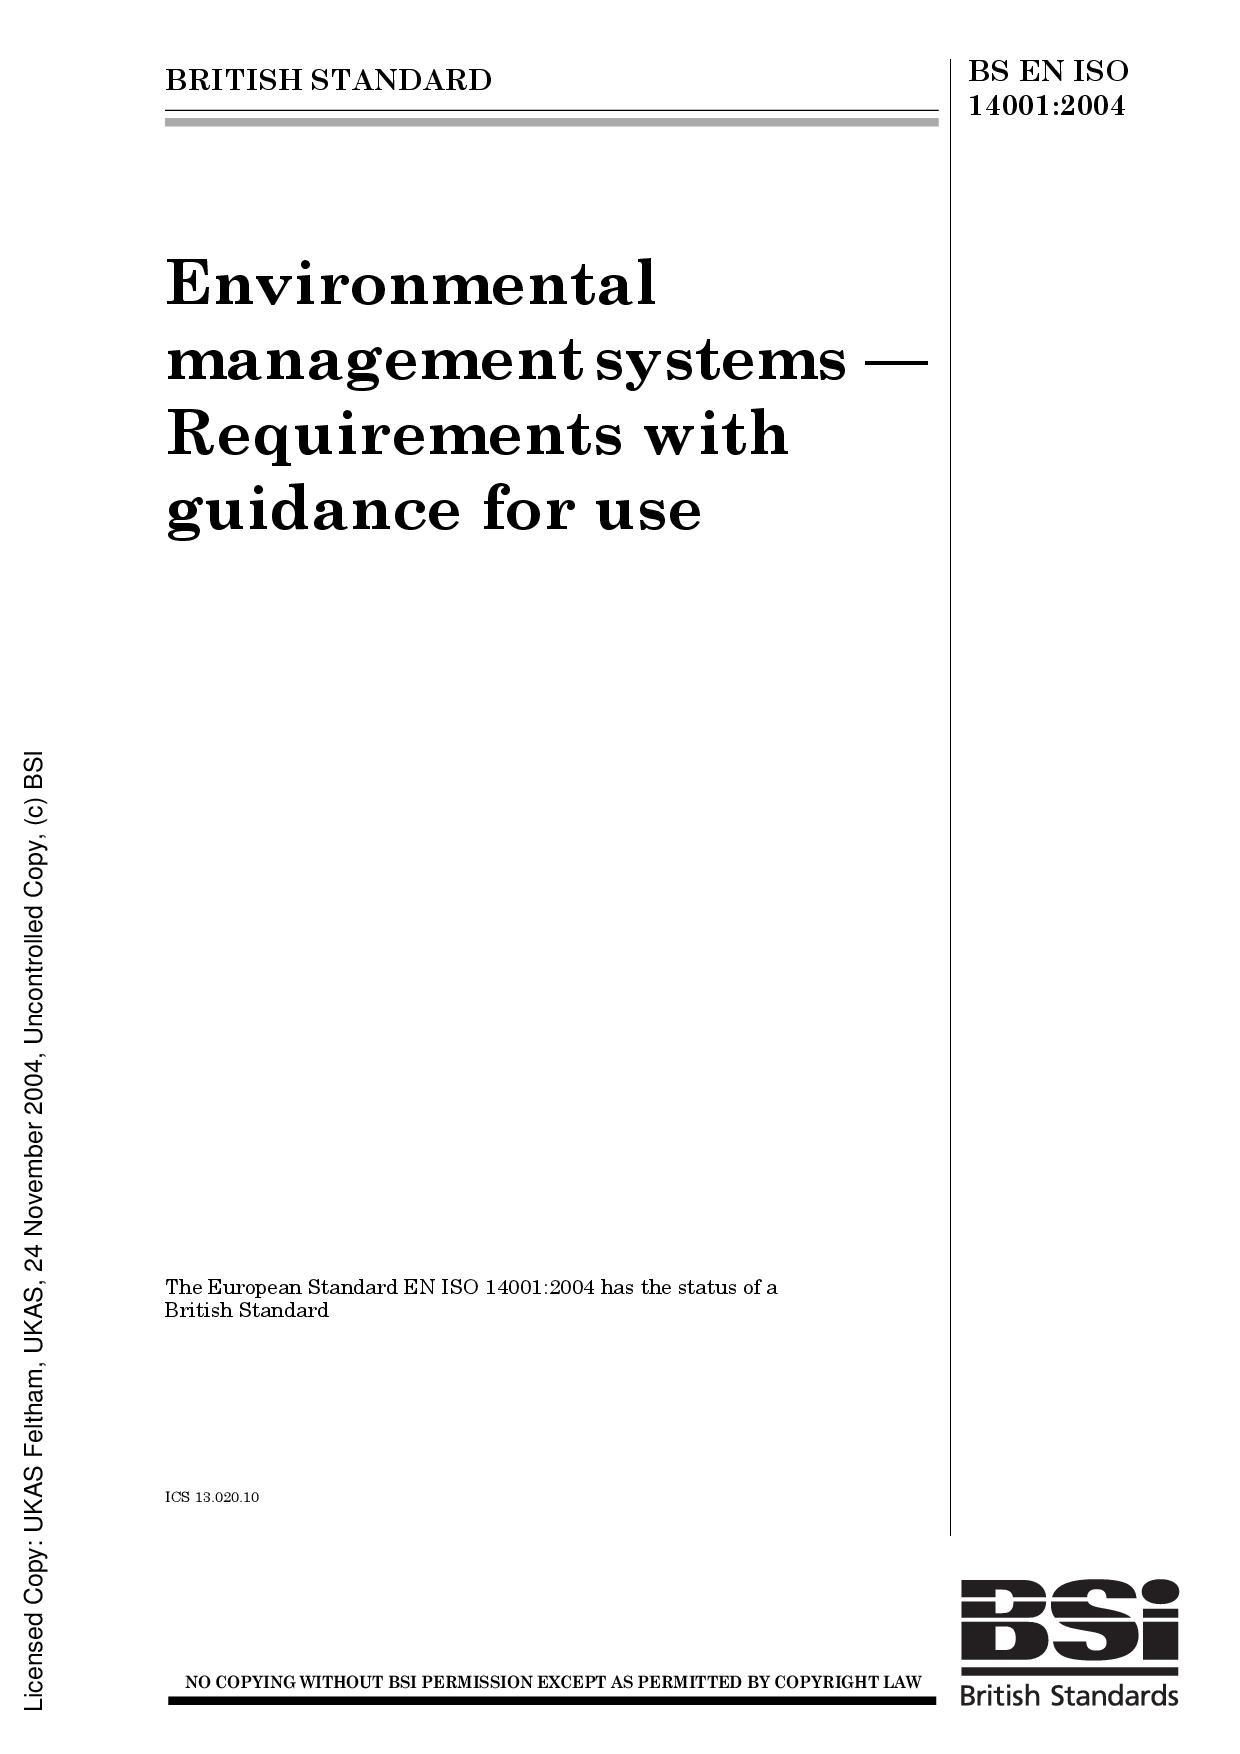 iso 14001 version 2015 standard pdf free download